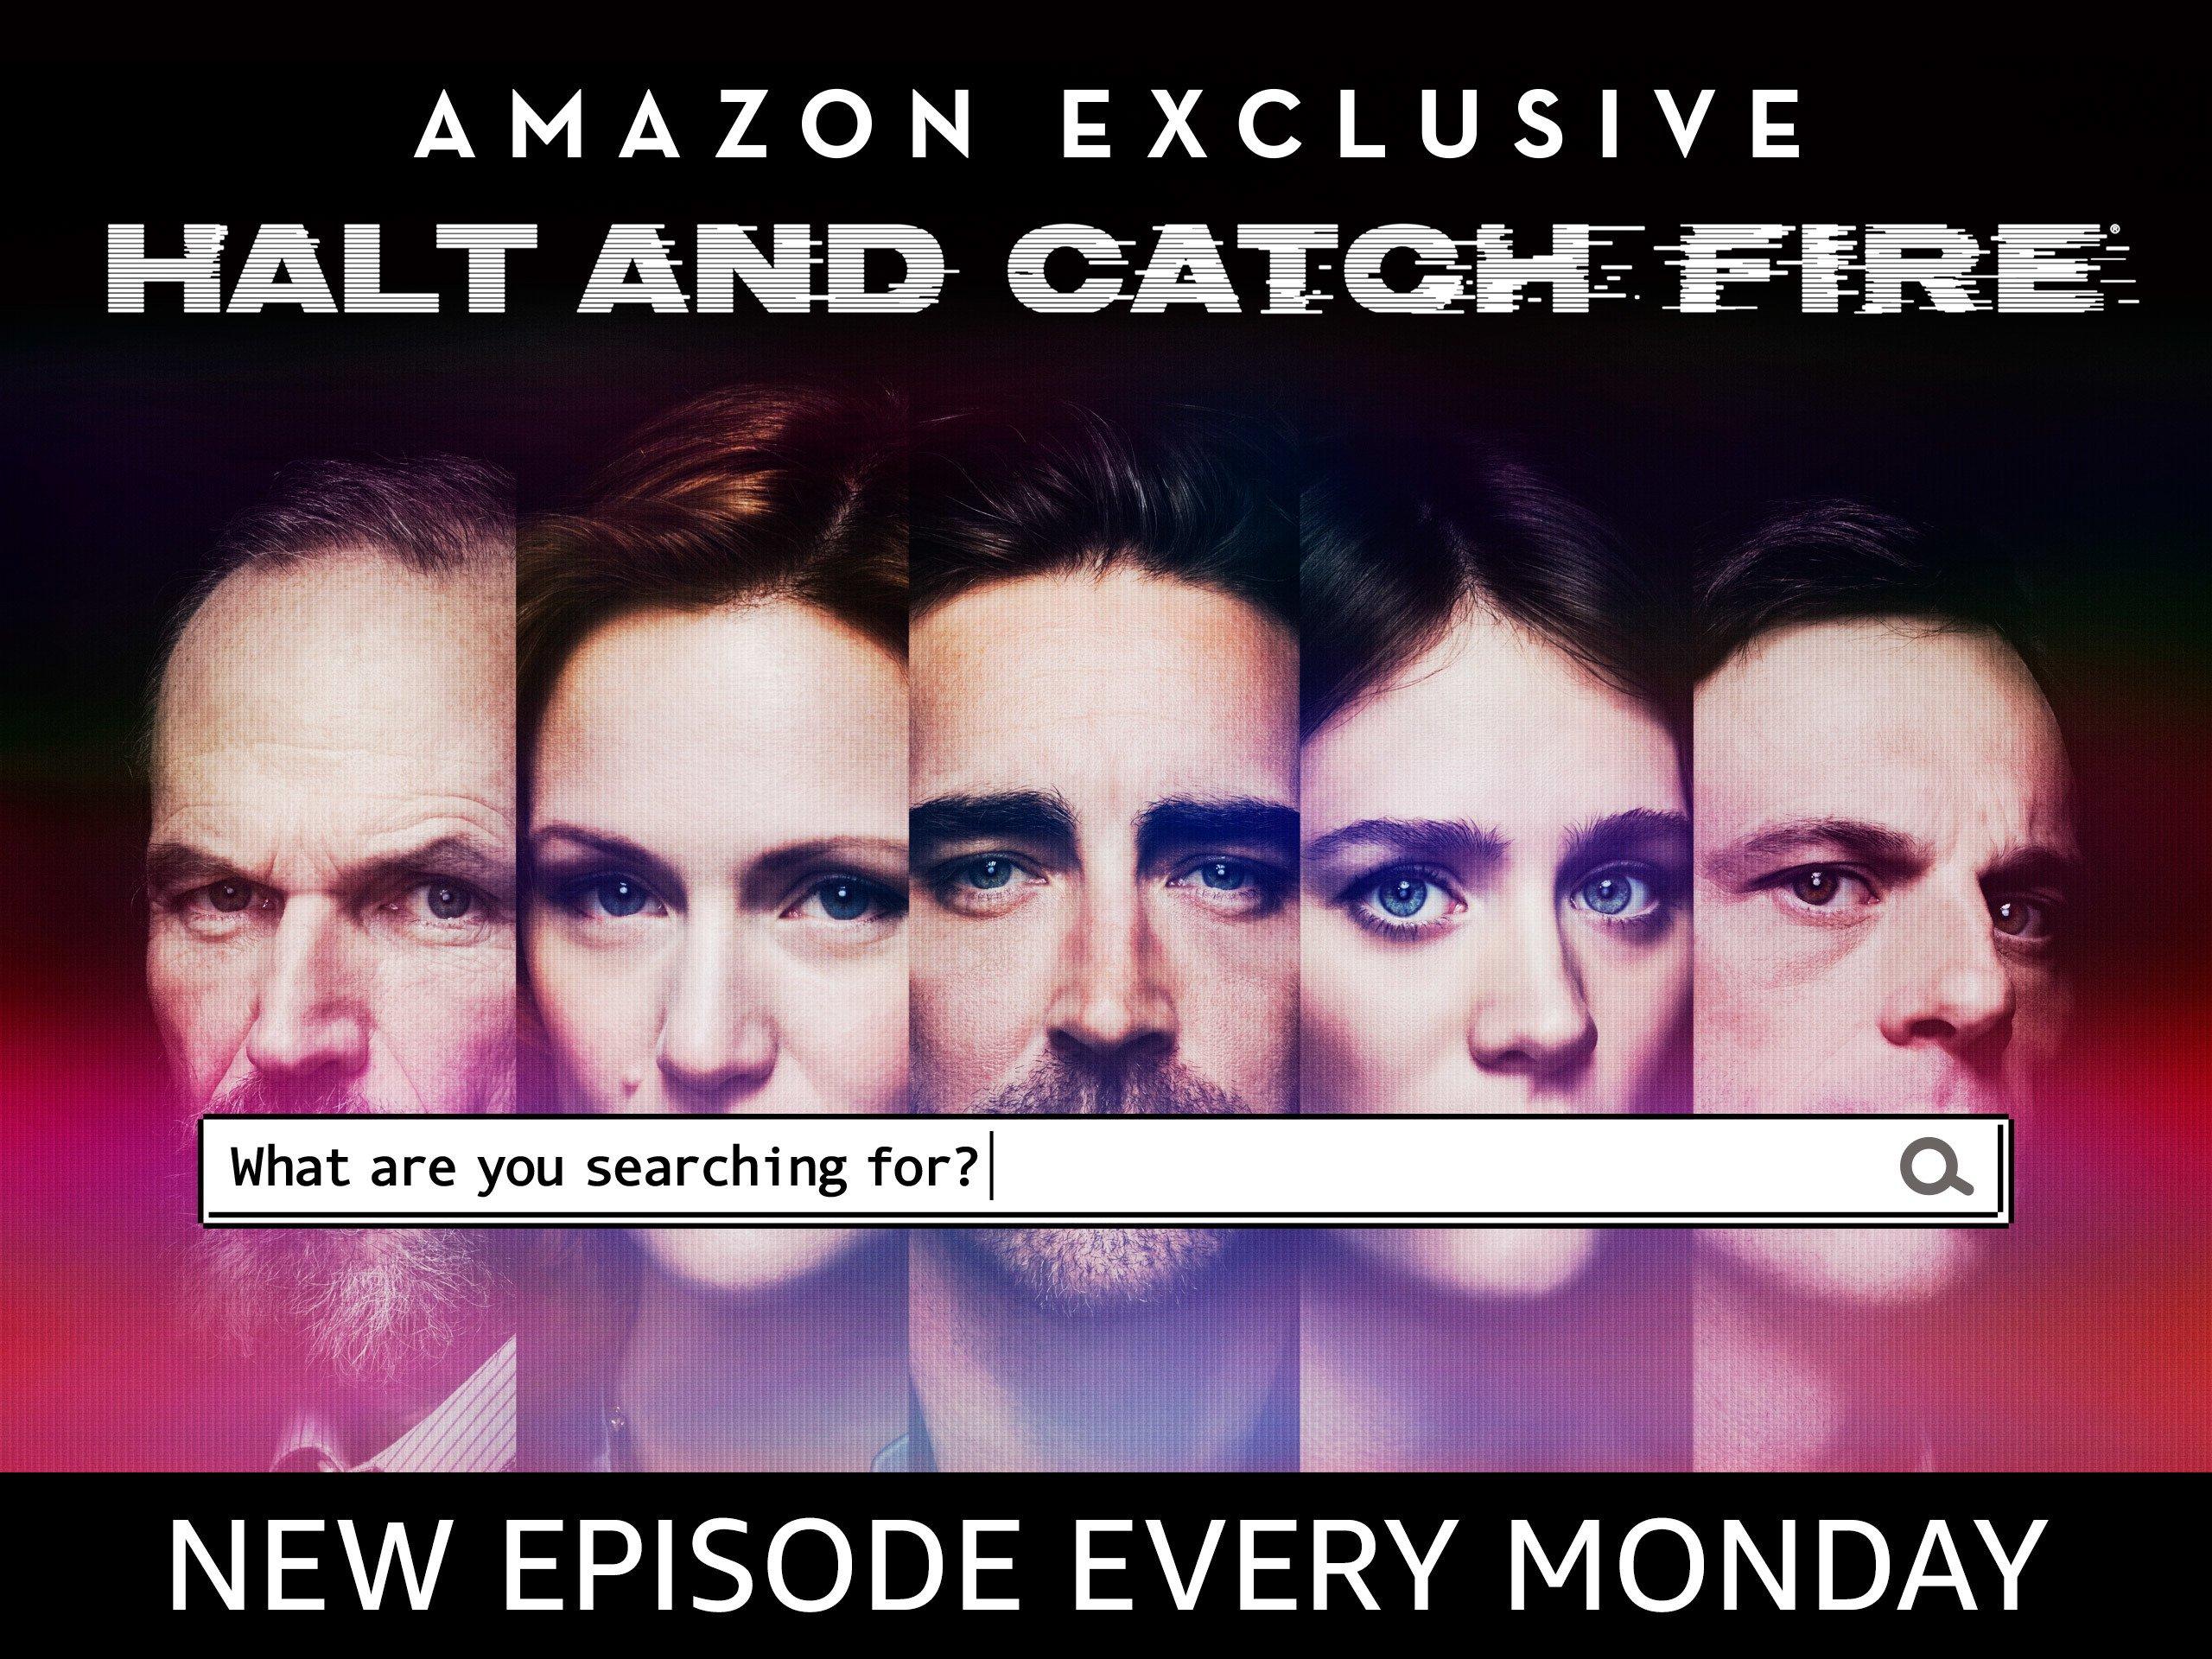 Halt and Catch Fire Season 4 - Season 4